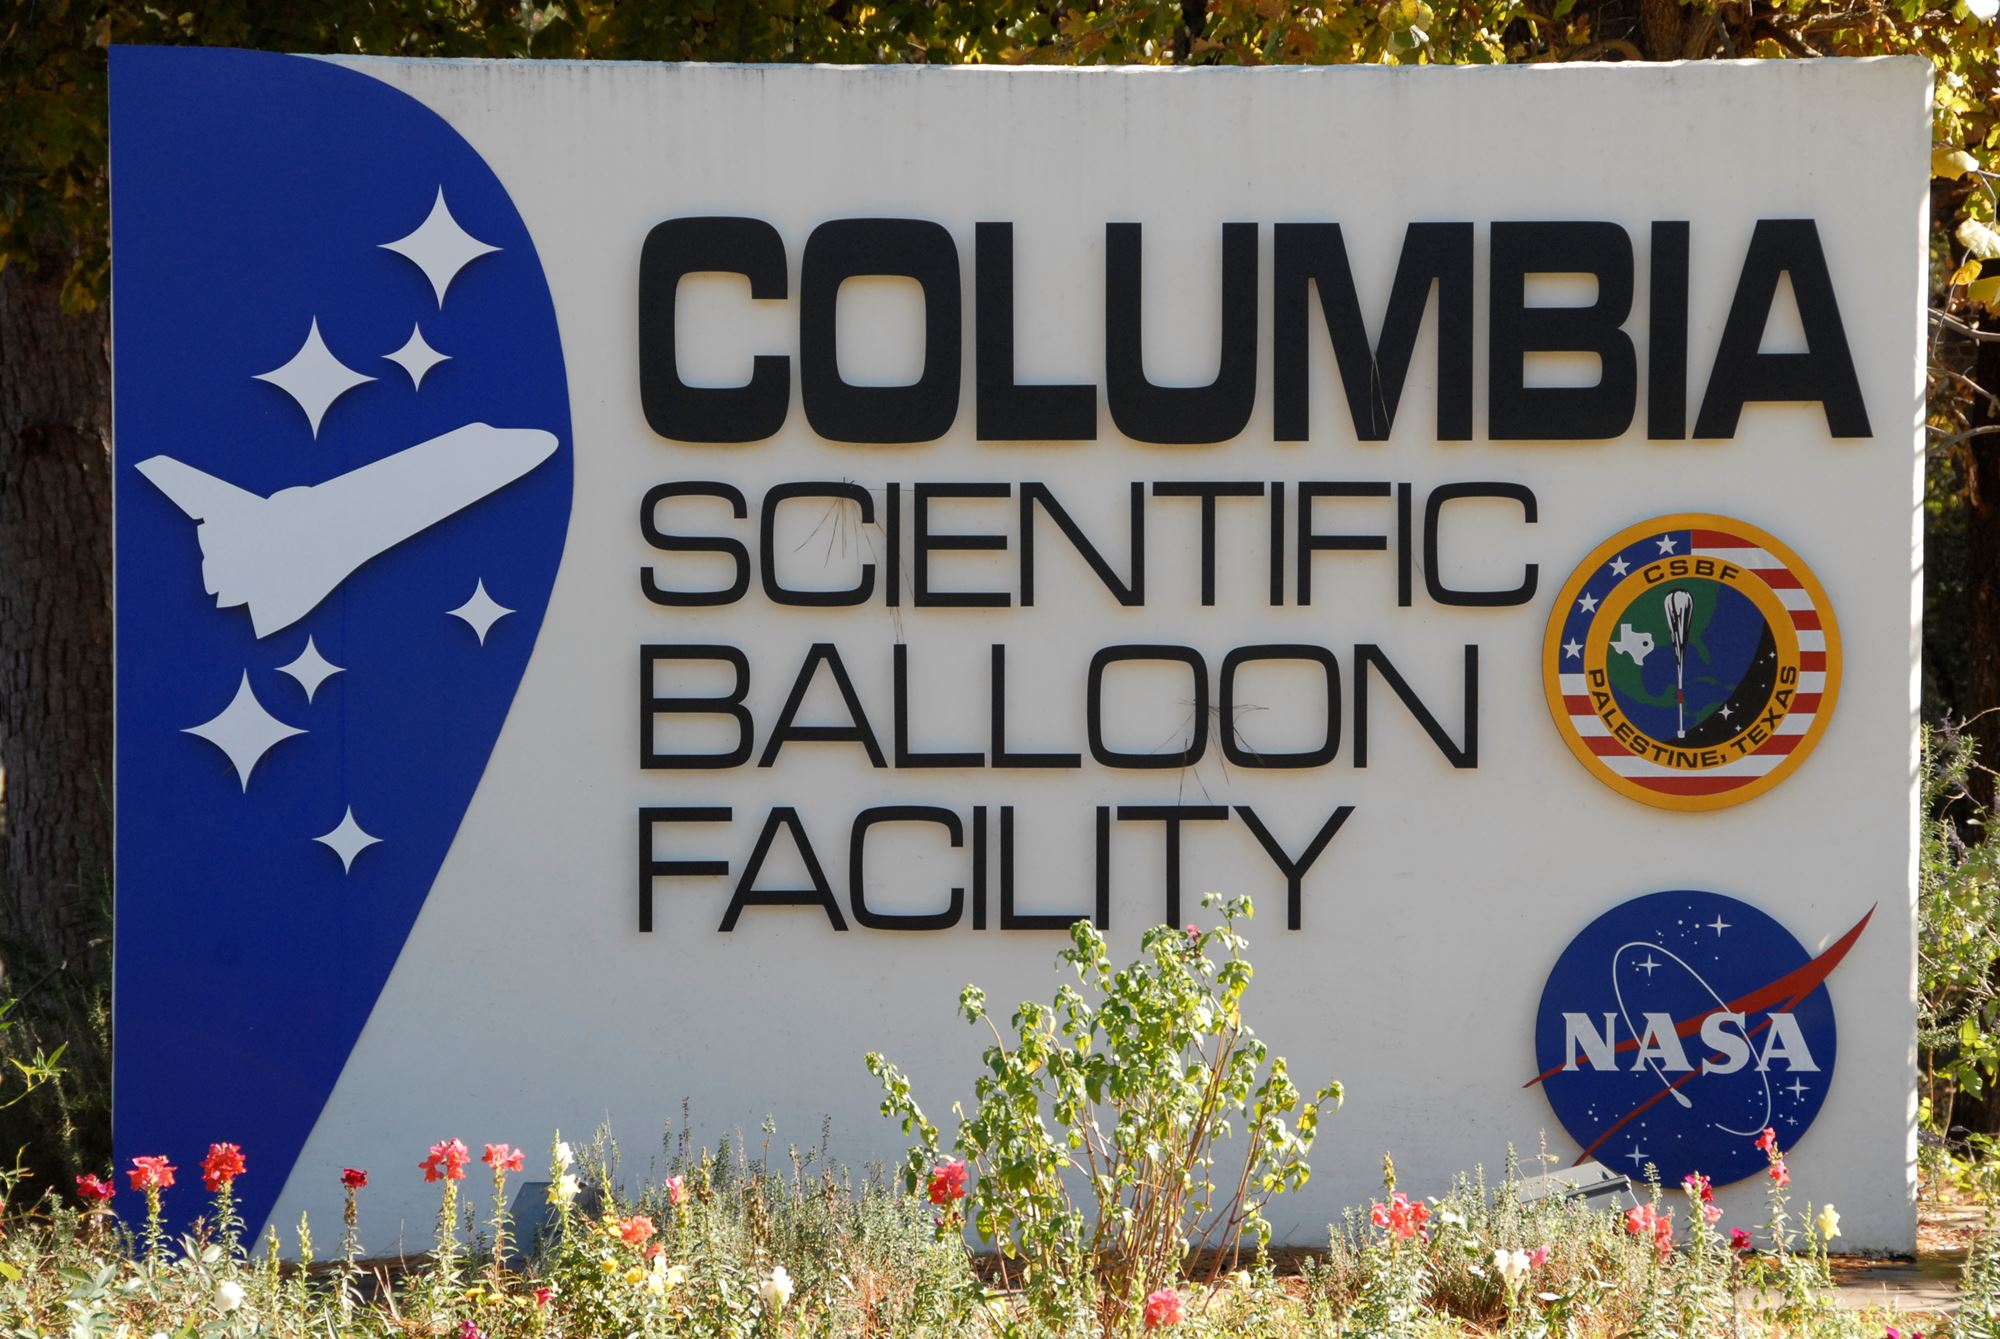 Columbia Scientific Balloon